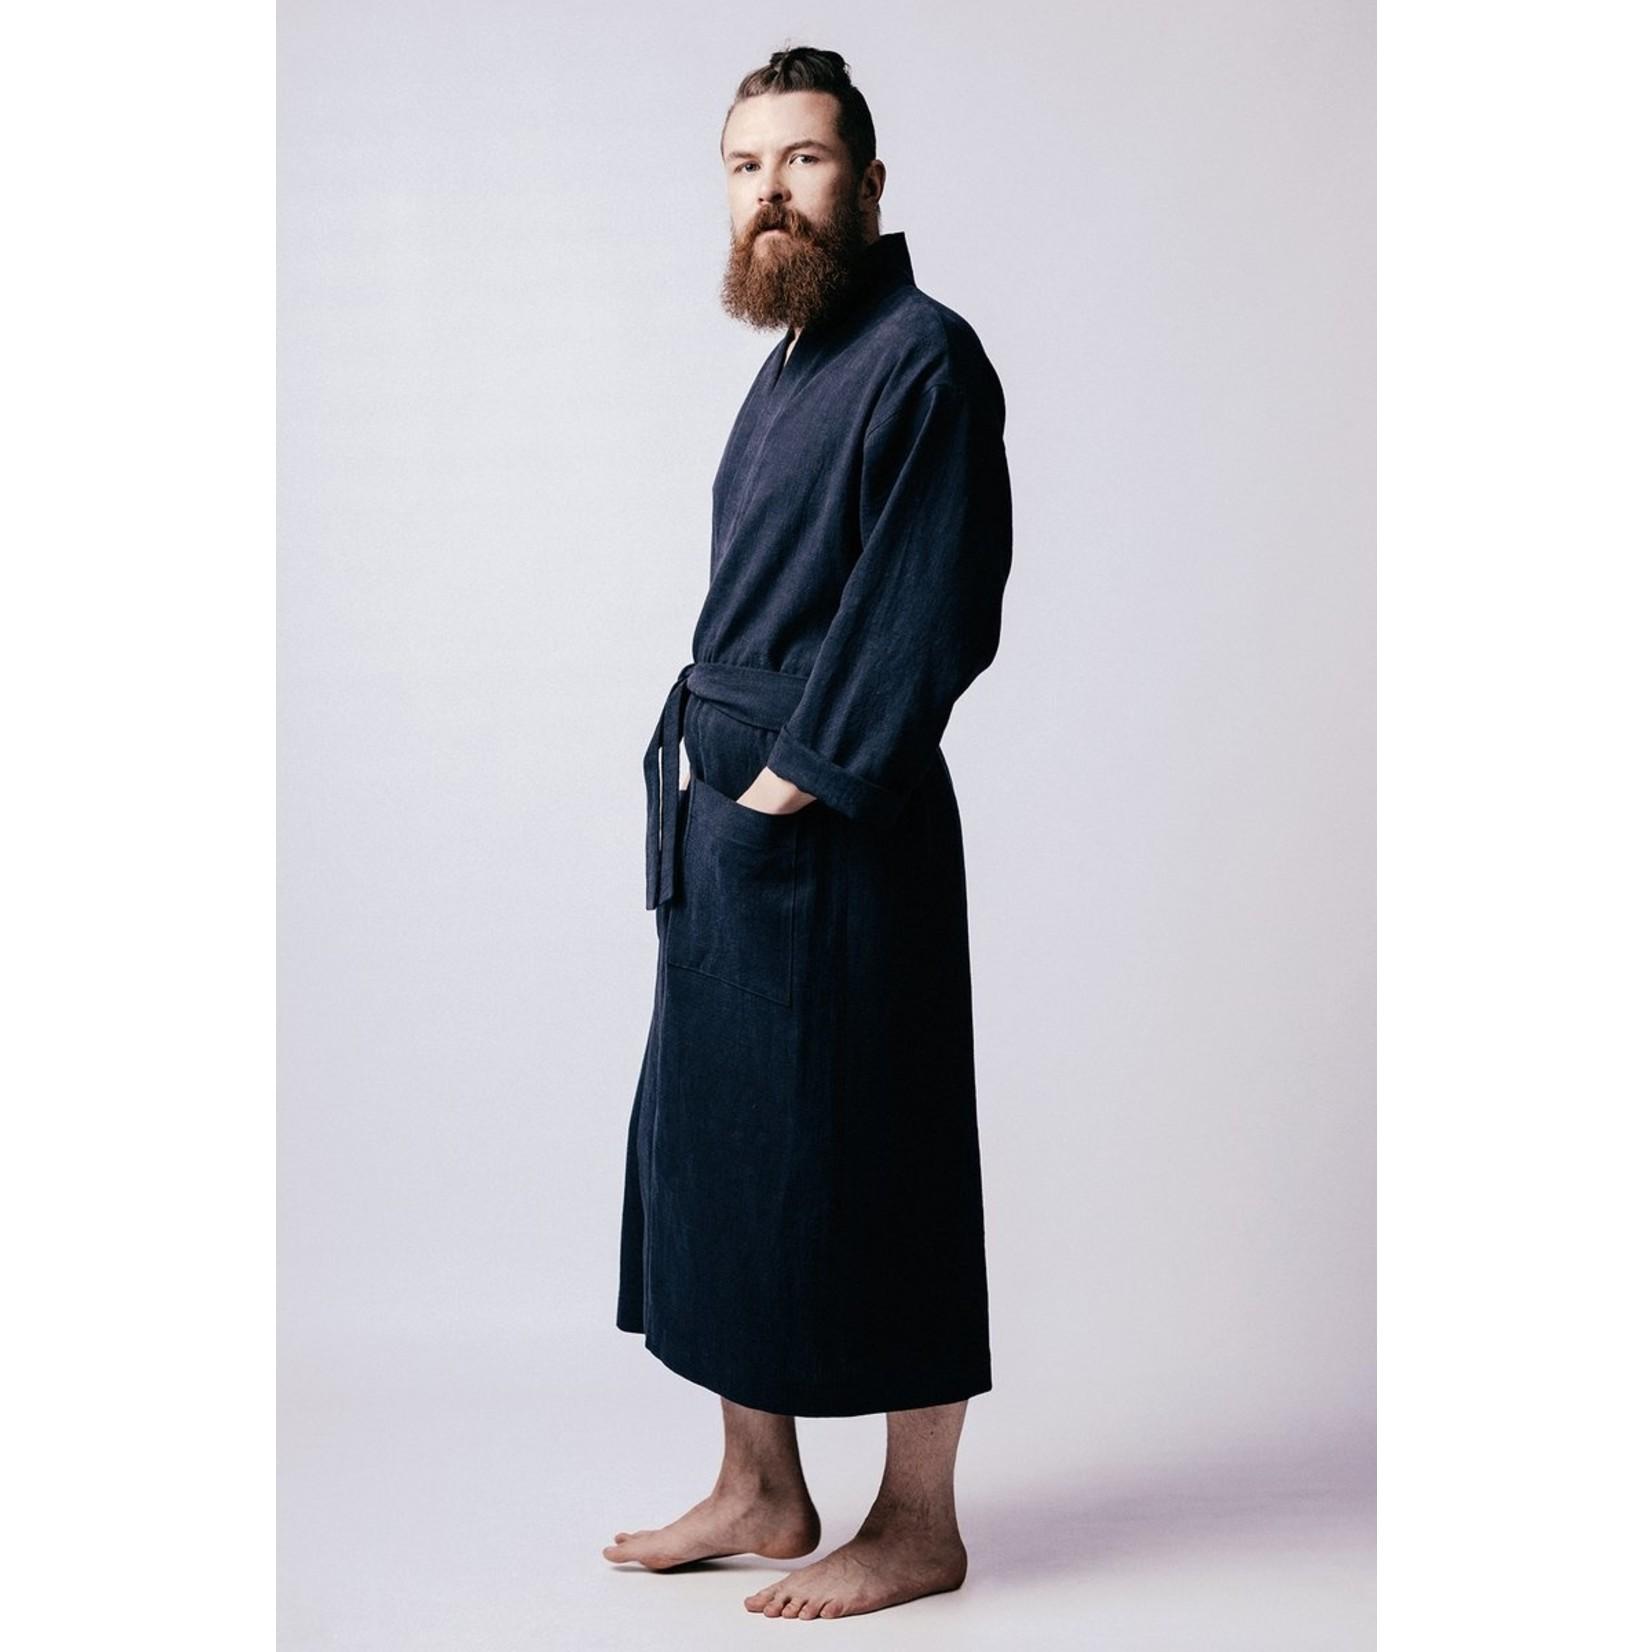 Named Clothing Lahja Unisex Dressing Gown 0-24 US